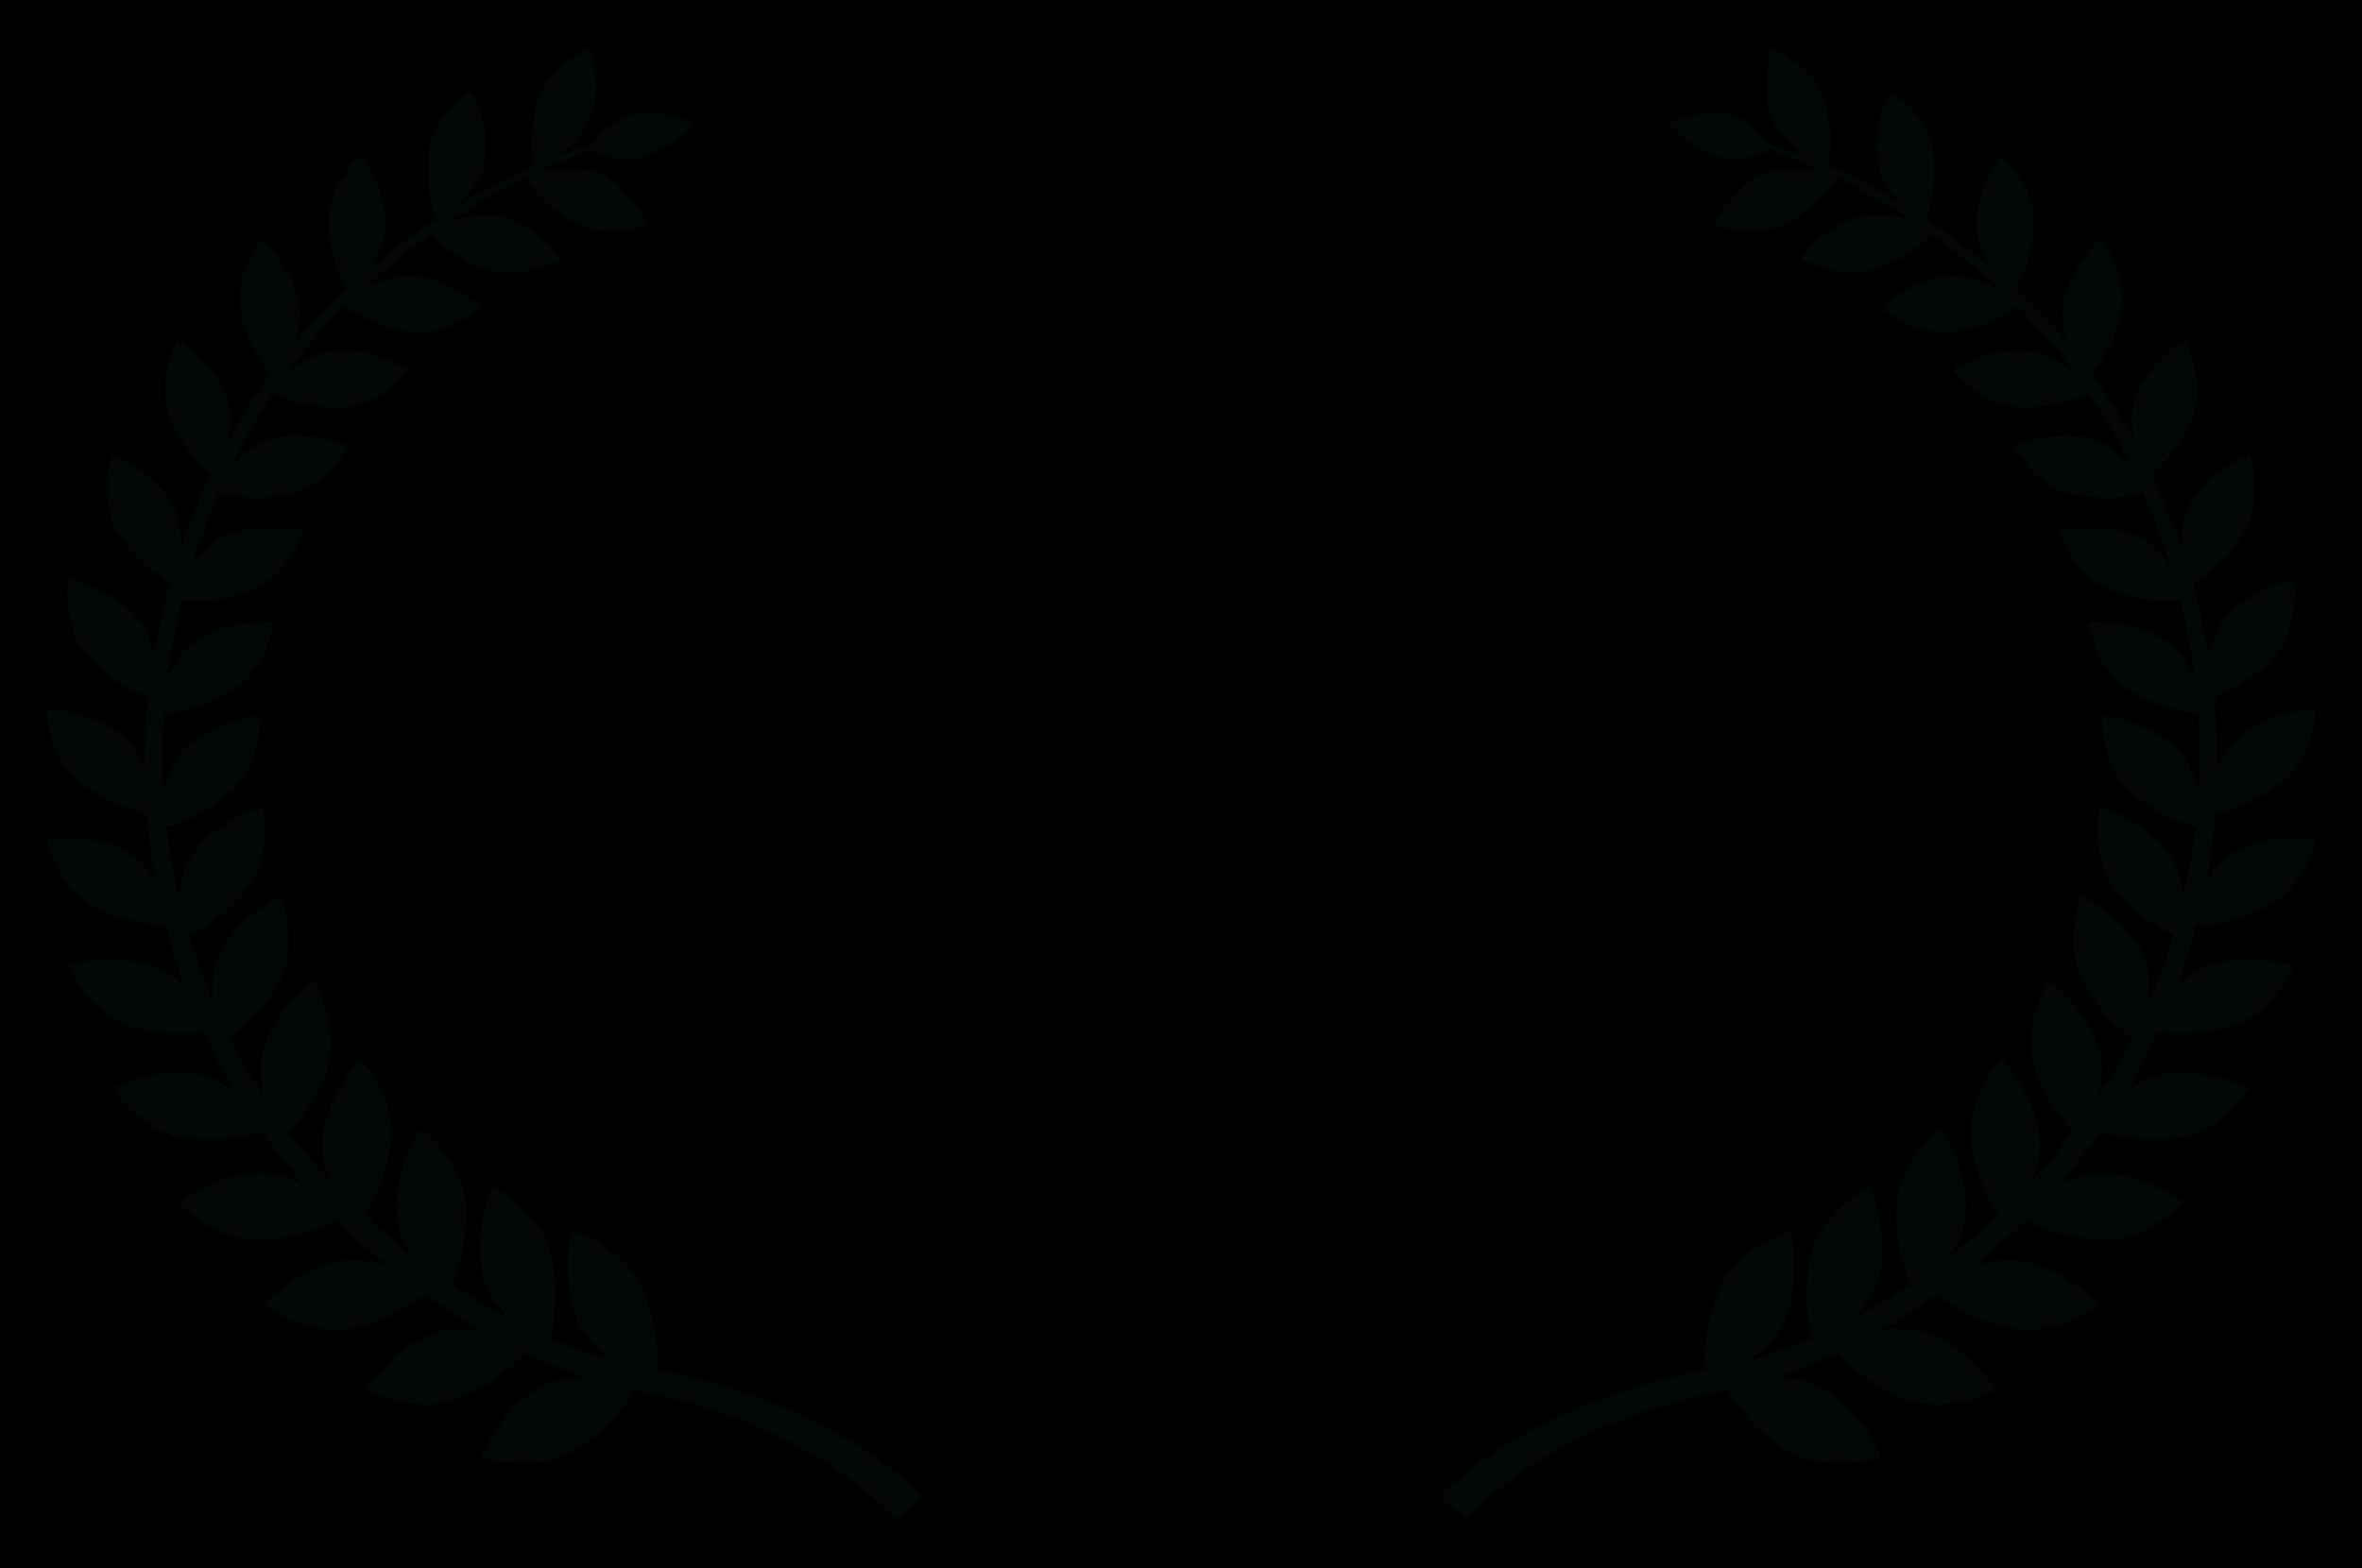 HIGHESTCOMMENDATION-b London-WorldwideComedyShortFilmFestival-Spring2019.png